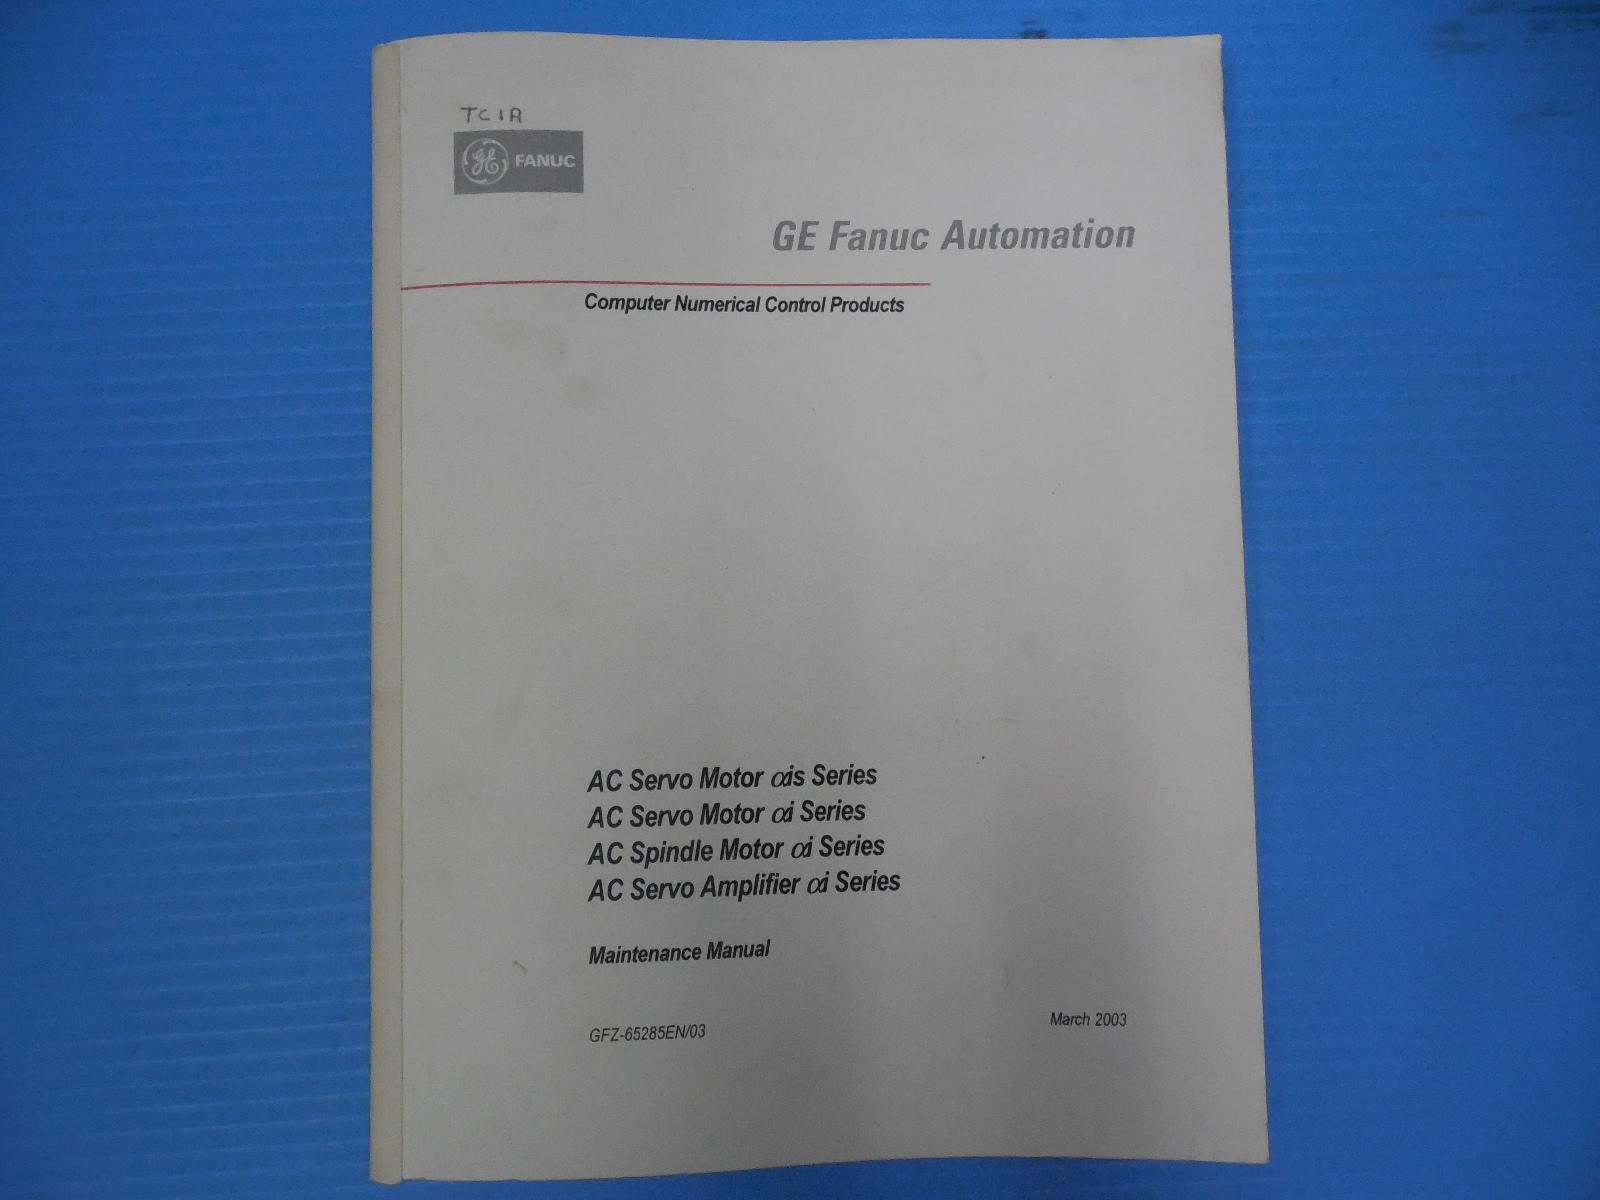 Onan 5bge manual